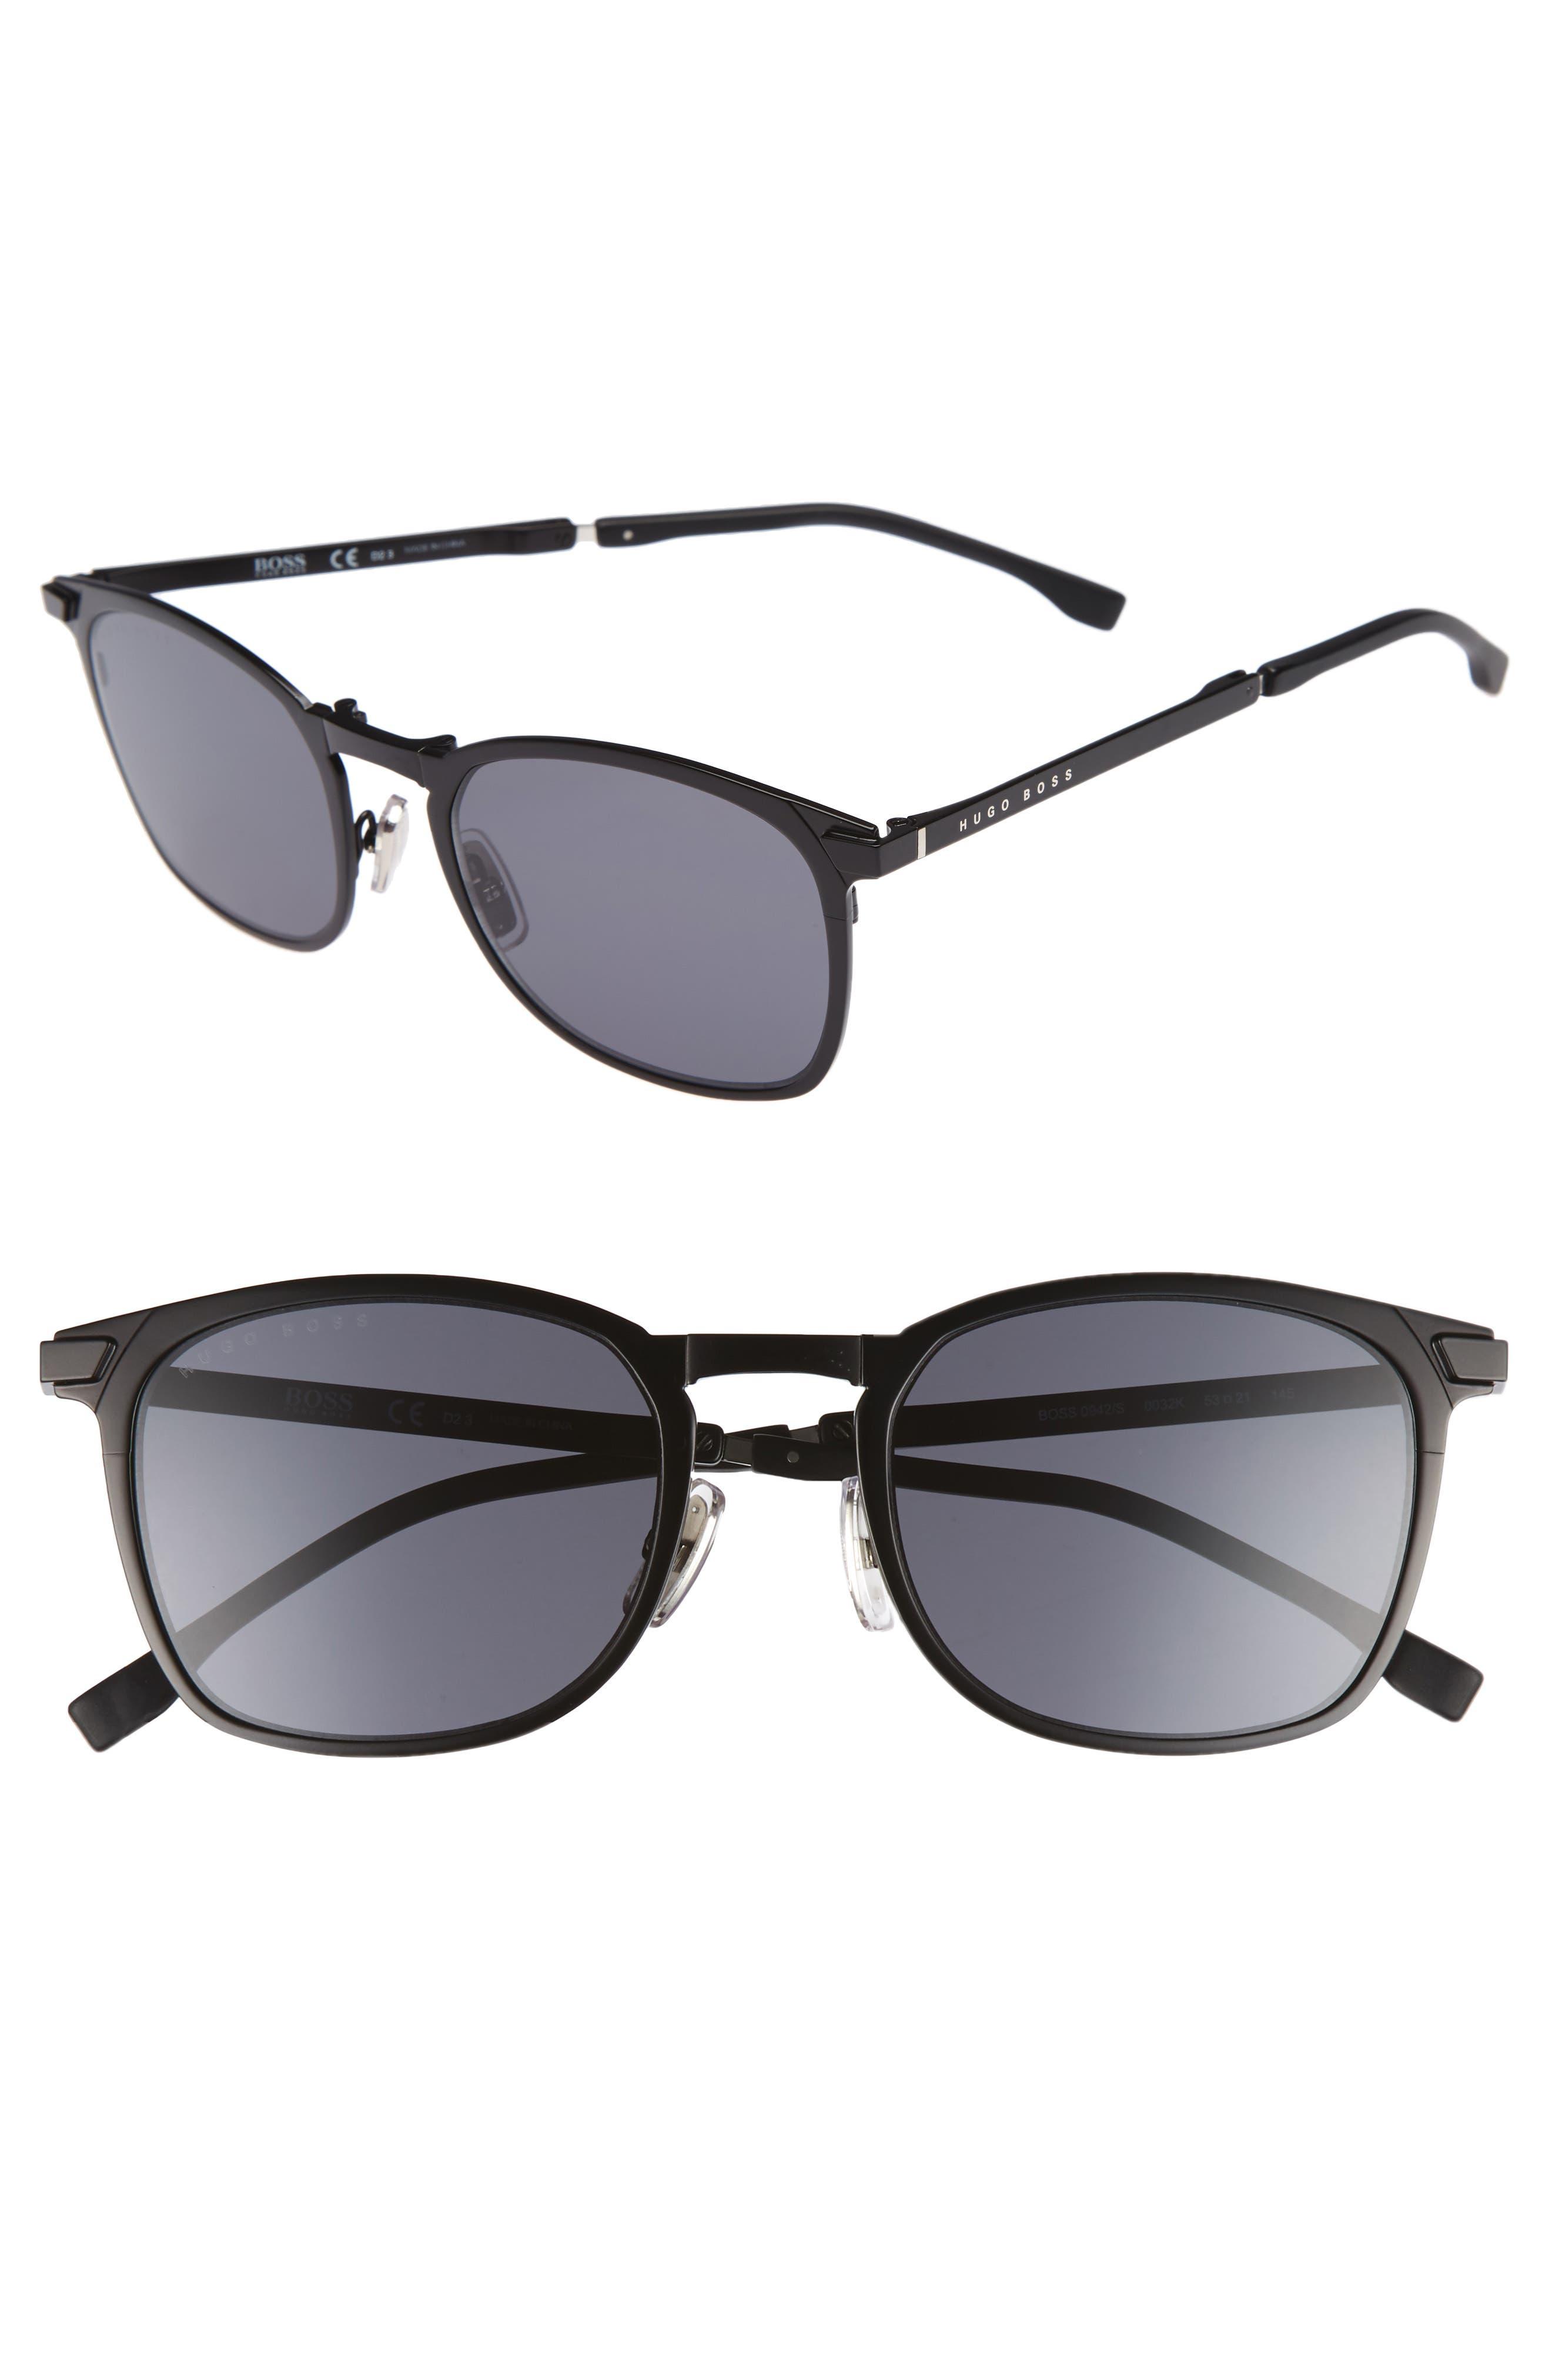 Main Image - BOSS 53mm Sunglasses